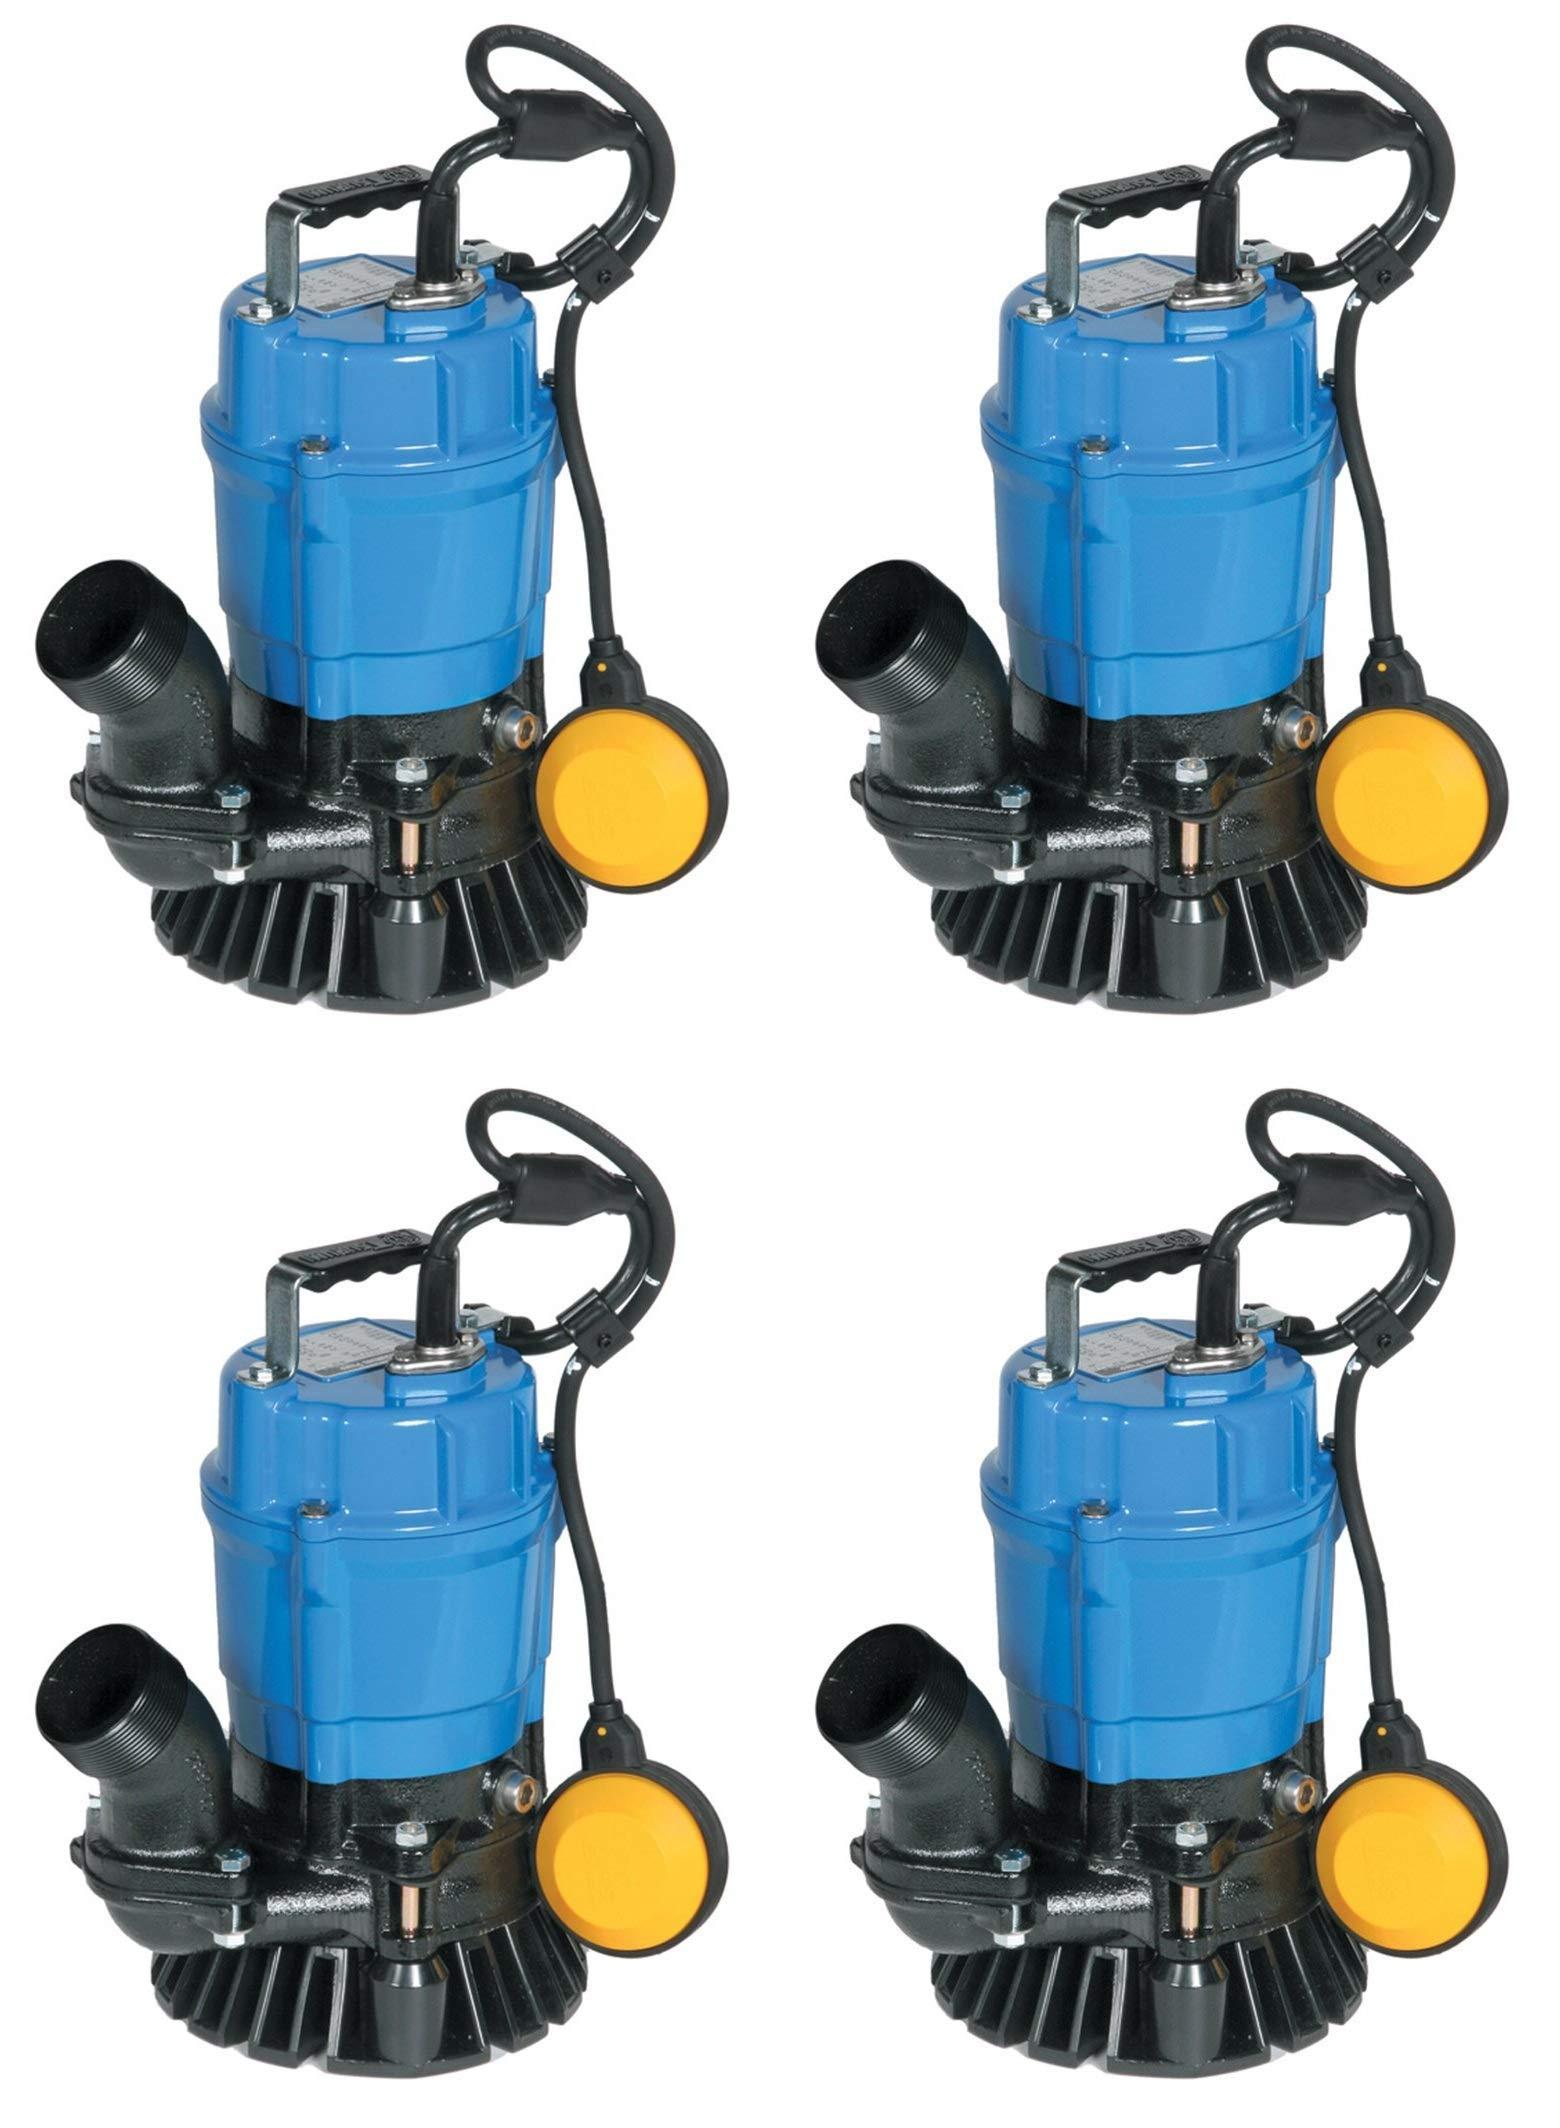 Tsurumi HSZ2.4S; Float Operated semi-Vortex Submersible Trash Pump w/Agitator, 1/2hp, 115V, 2'' Discharge (Fоur Расk)